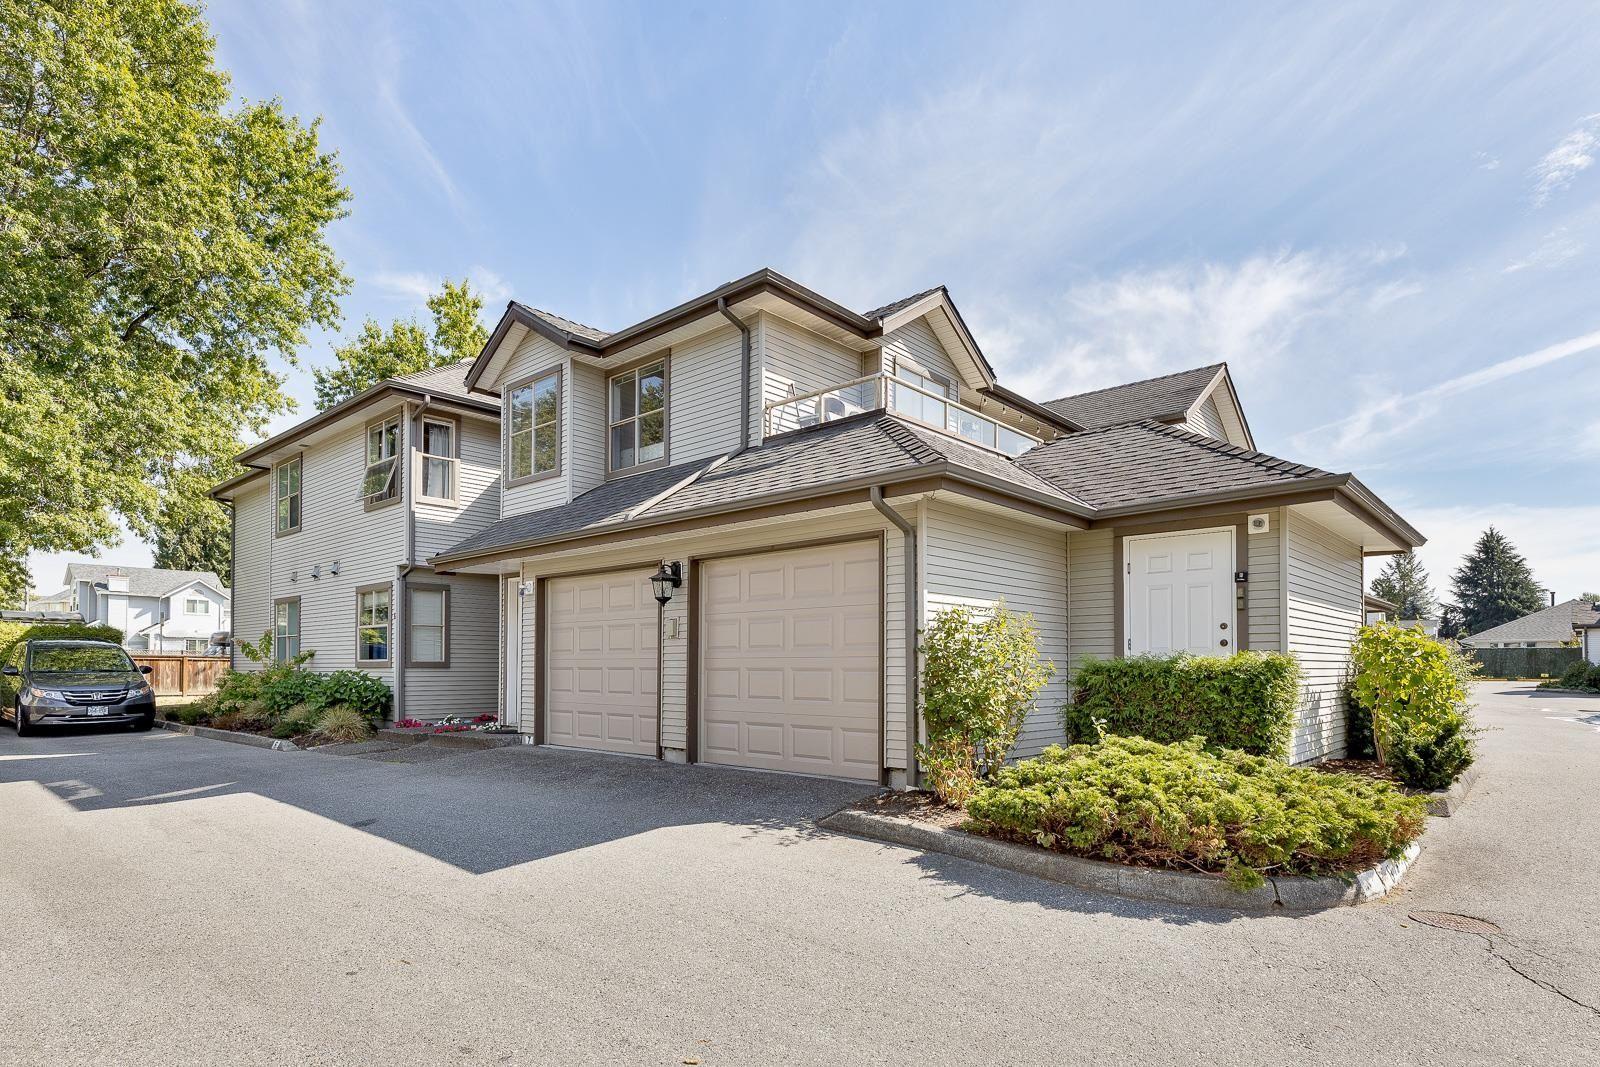 "Main Photo: 7 19160 119 Avenue in Pitt Meadows: Central Meadows Townhouse for sale in ""WINDSOR OAK"" : MLS®# R2616847"